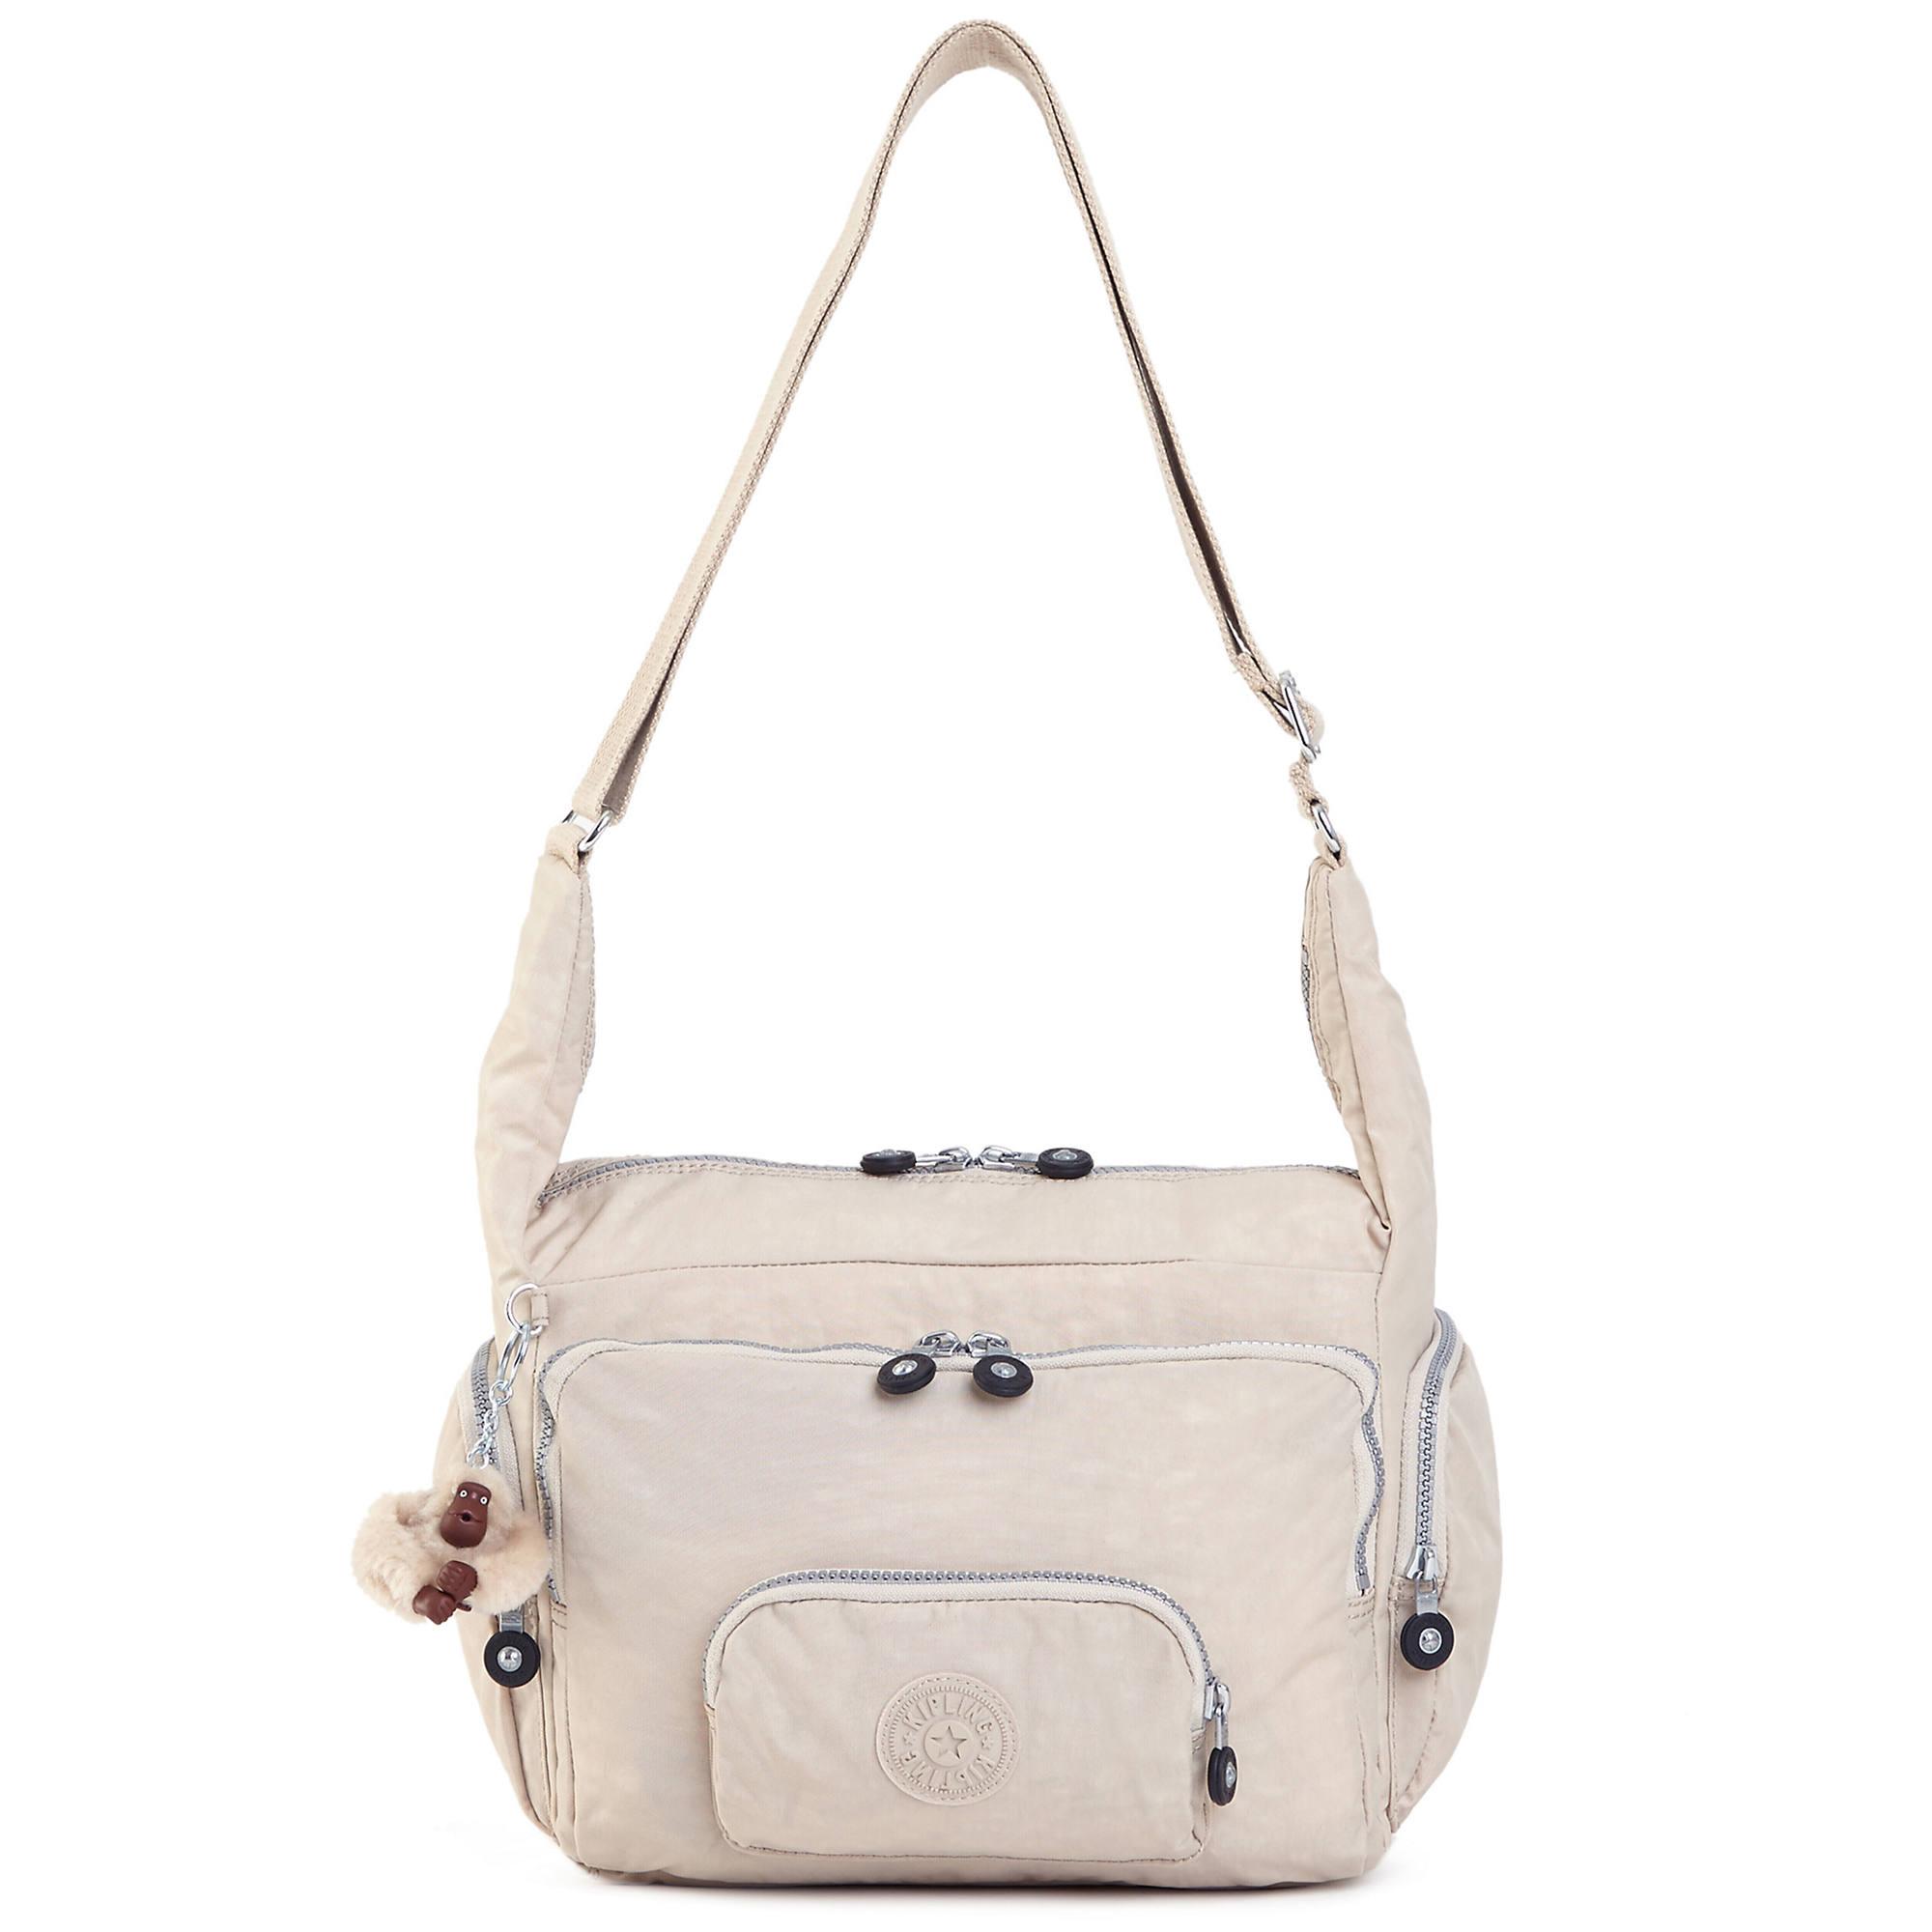 Unisex Stylish Satchel Messenger Bags American And Mali Retro Flag Crossbody Shoulder Bag Side Bags For School//Work//Trips